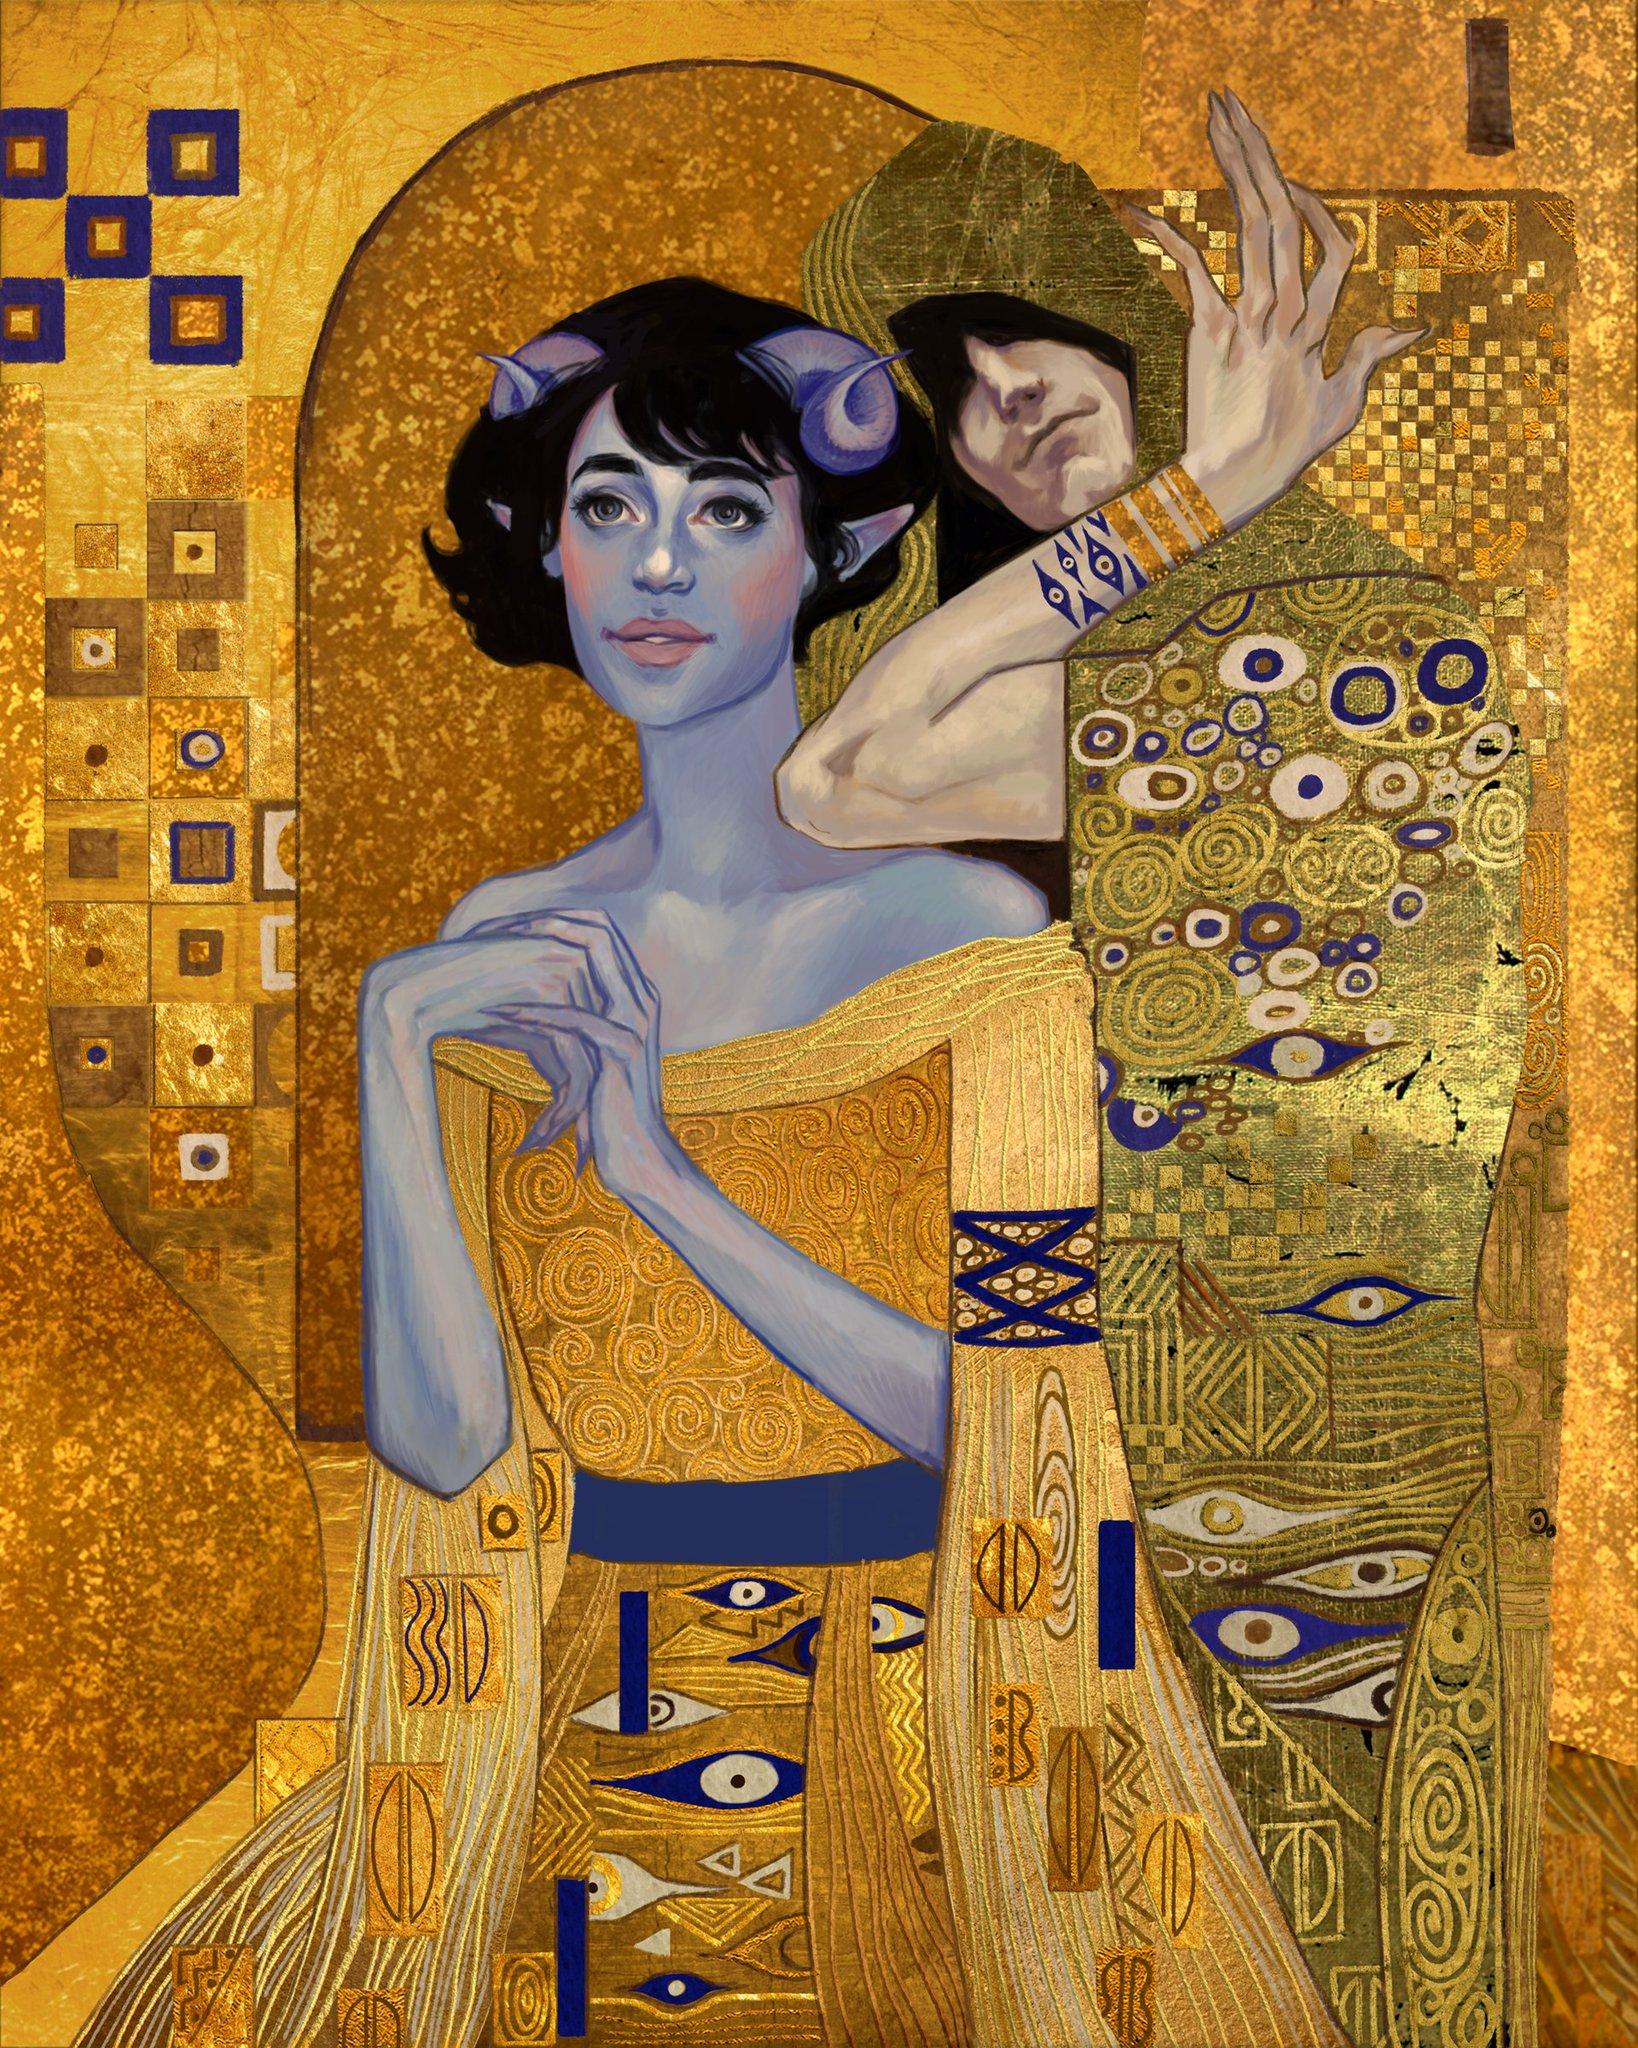 Part 2 of 4 The Klimt one was soooo difficult.  Caduceus was a soothing joy, as always. Jester- Gustav Klimt Caduceus- Alphonse Mucha #criticalrolefanart https://t.co/ZbNJXhaz4B